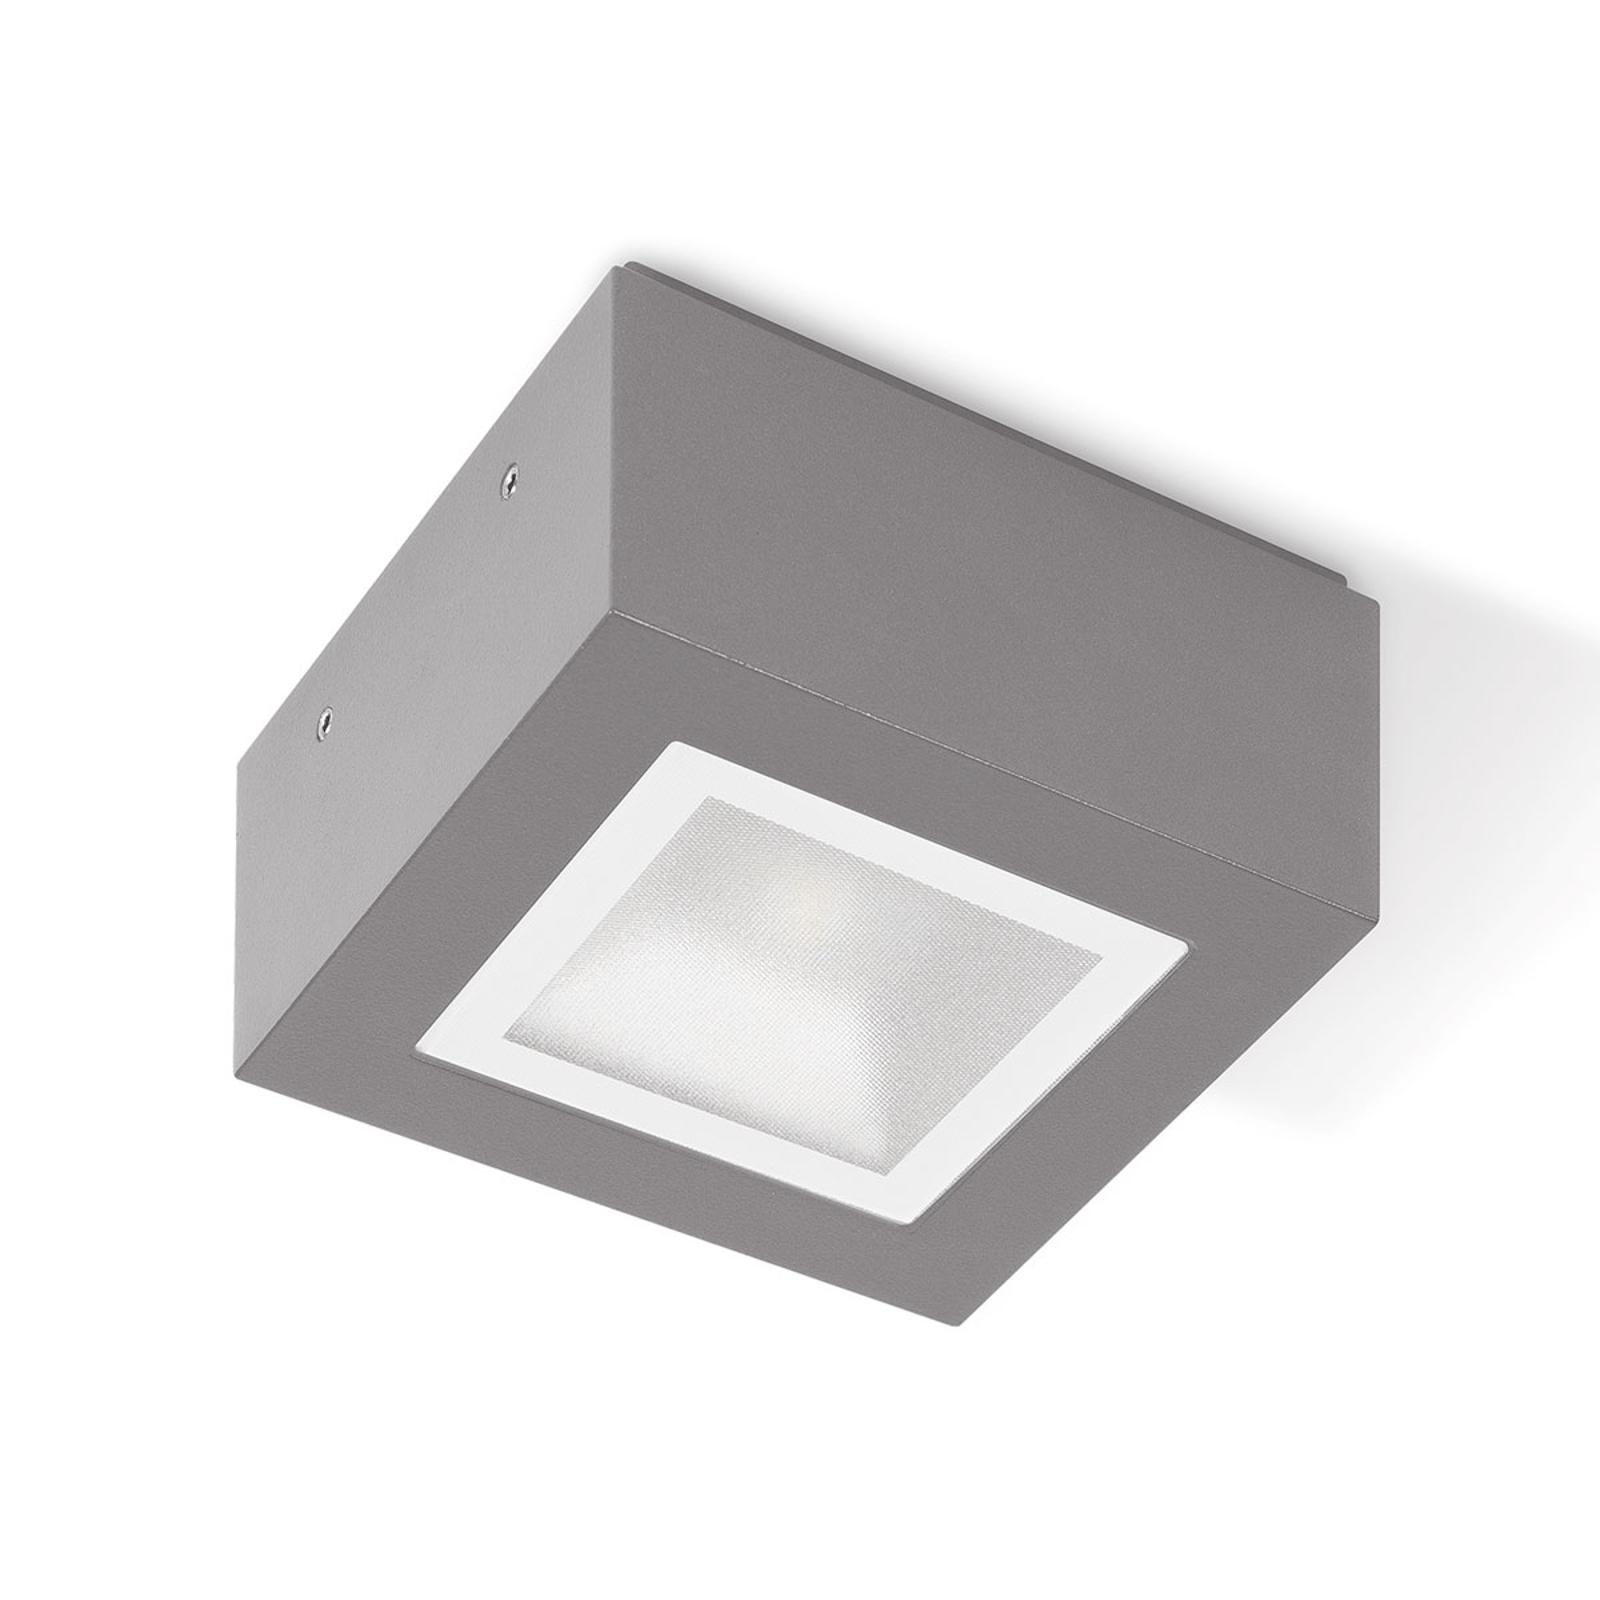 Lampa sufitowa LED Mimik 10 Tech 4000 K